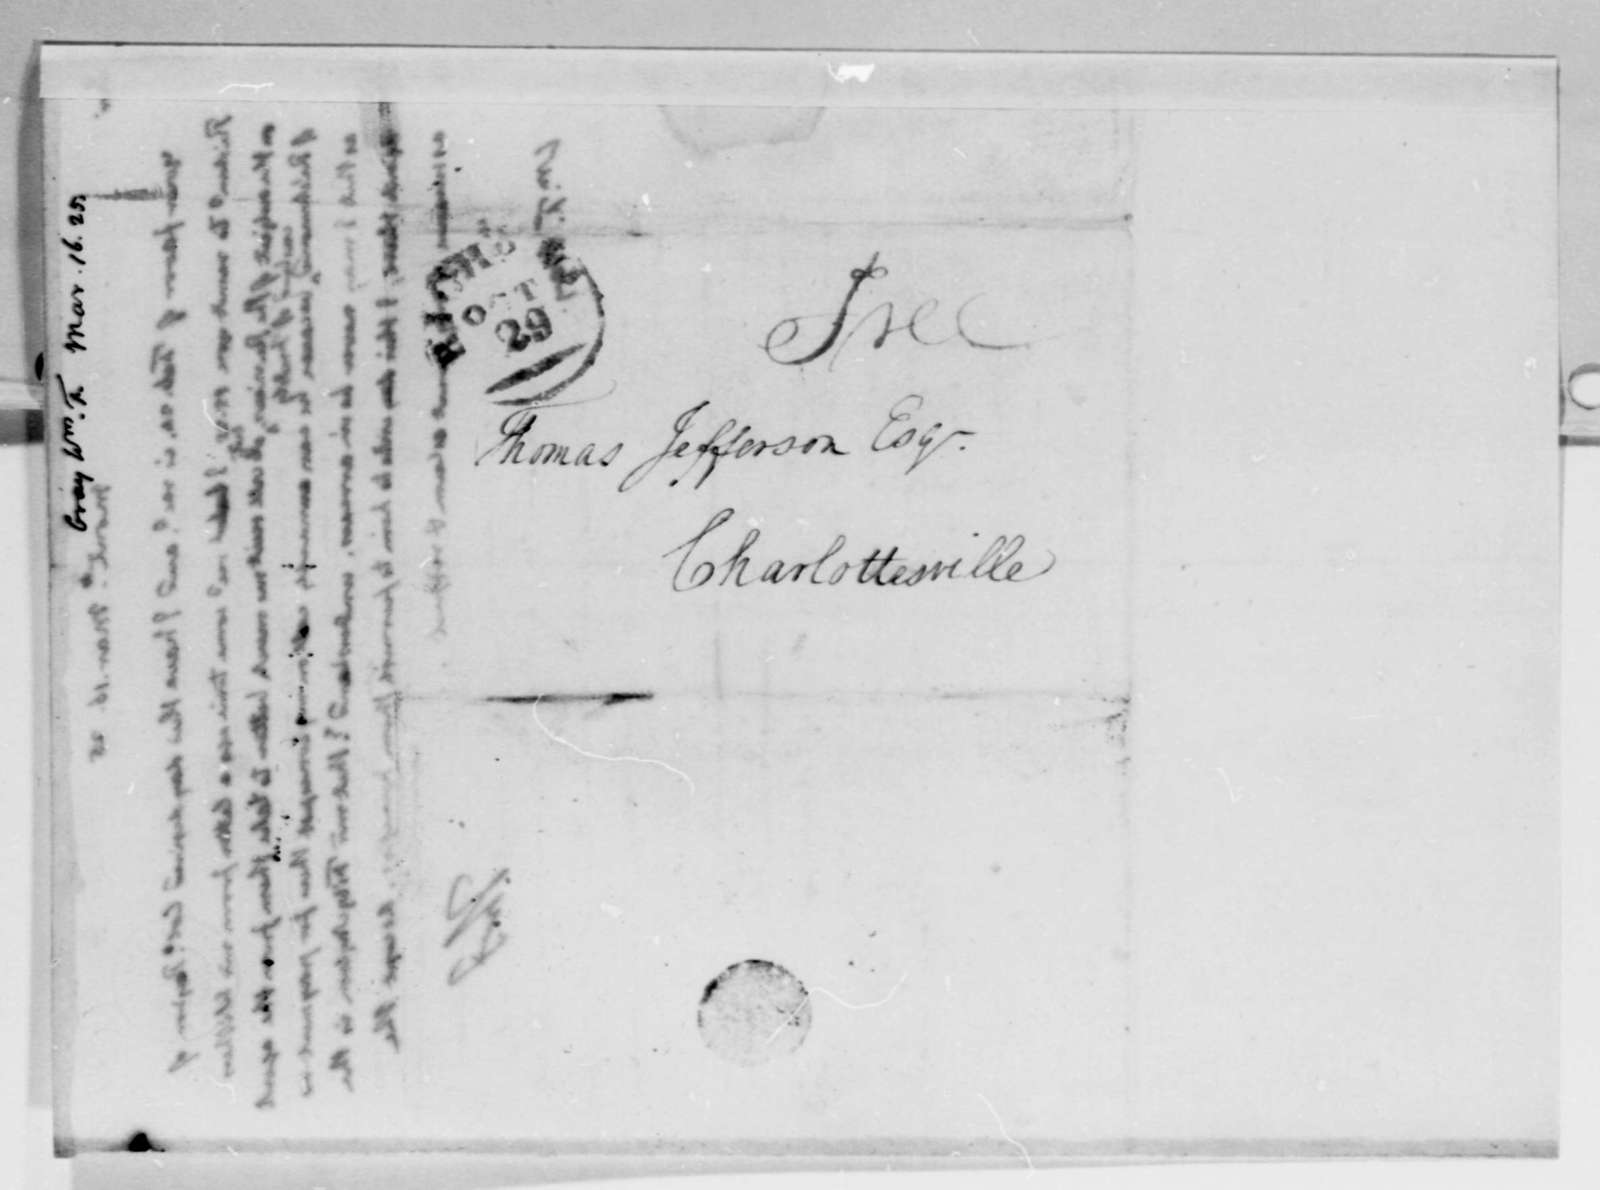 Thomas Jefferson to William F. Gray, March 16, 1825